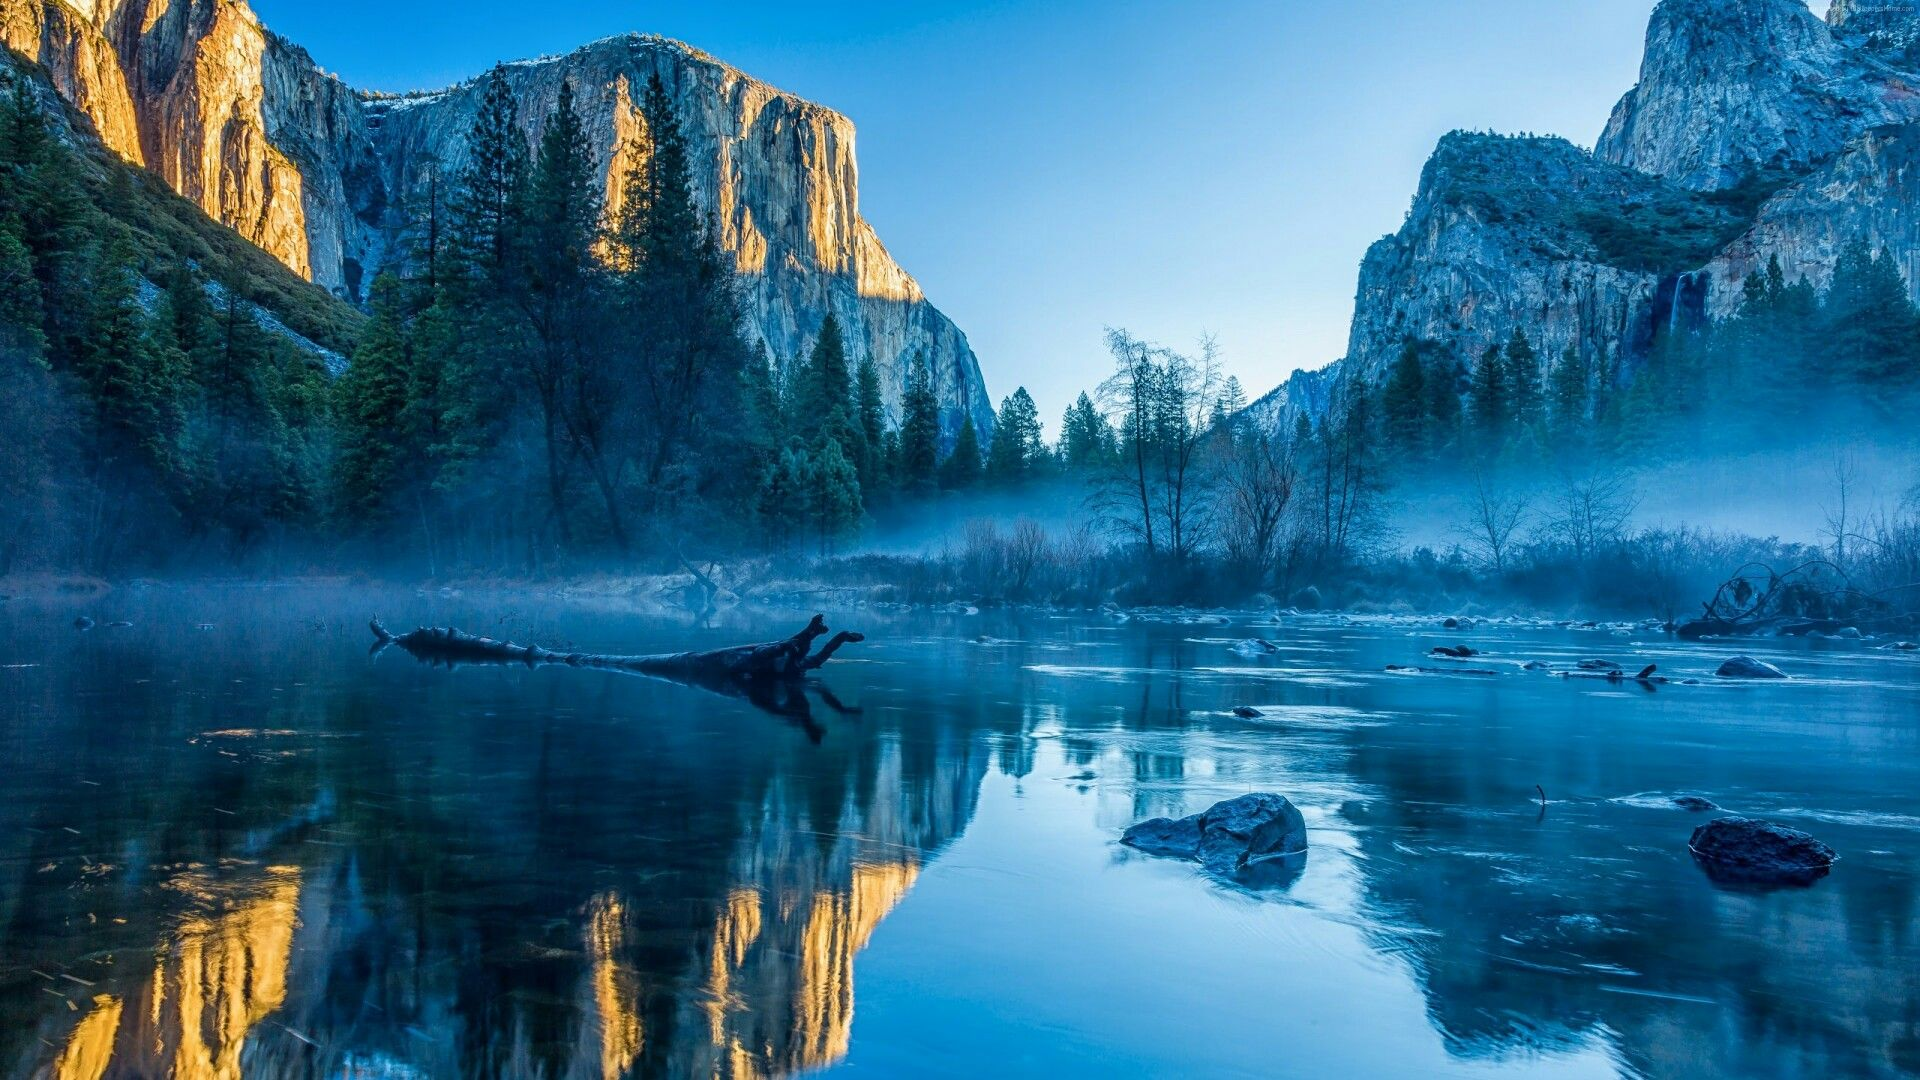 Yosemite, MOUNTAINS, WINTER, nature Yosemite wallpaper